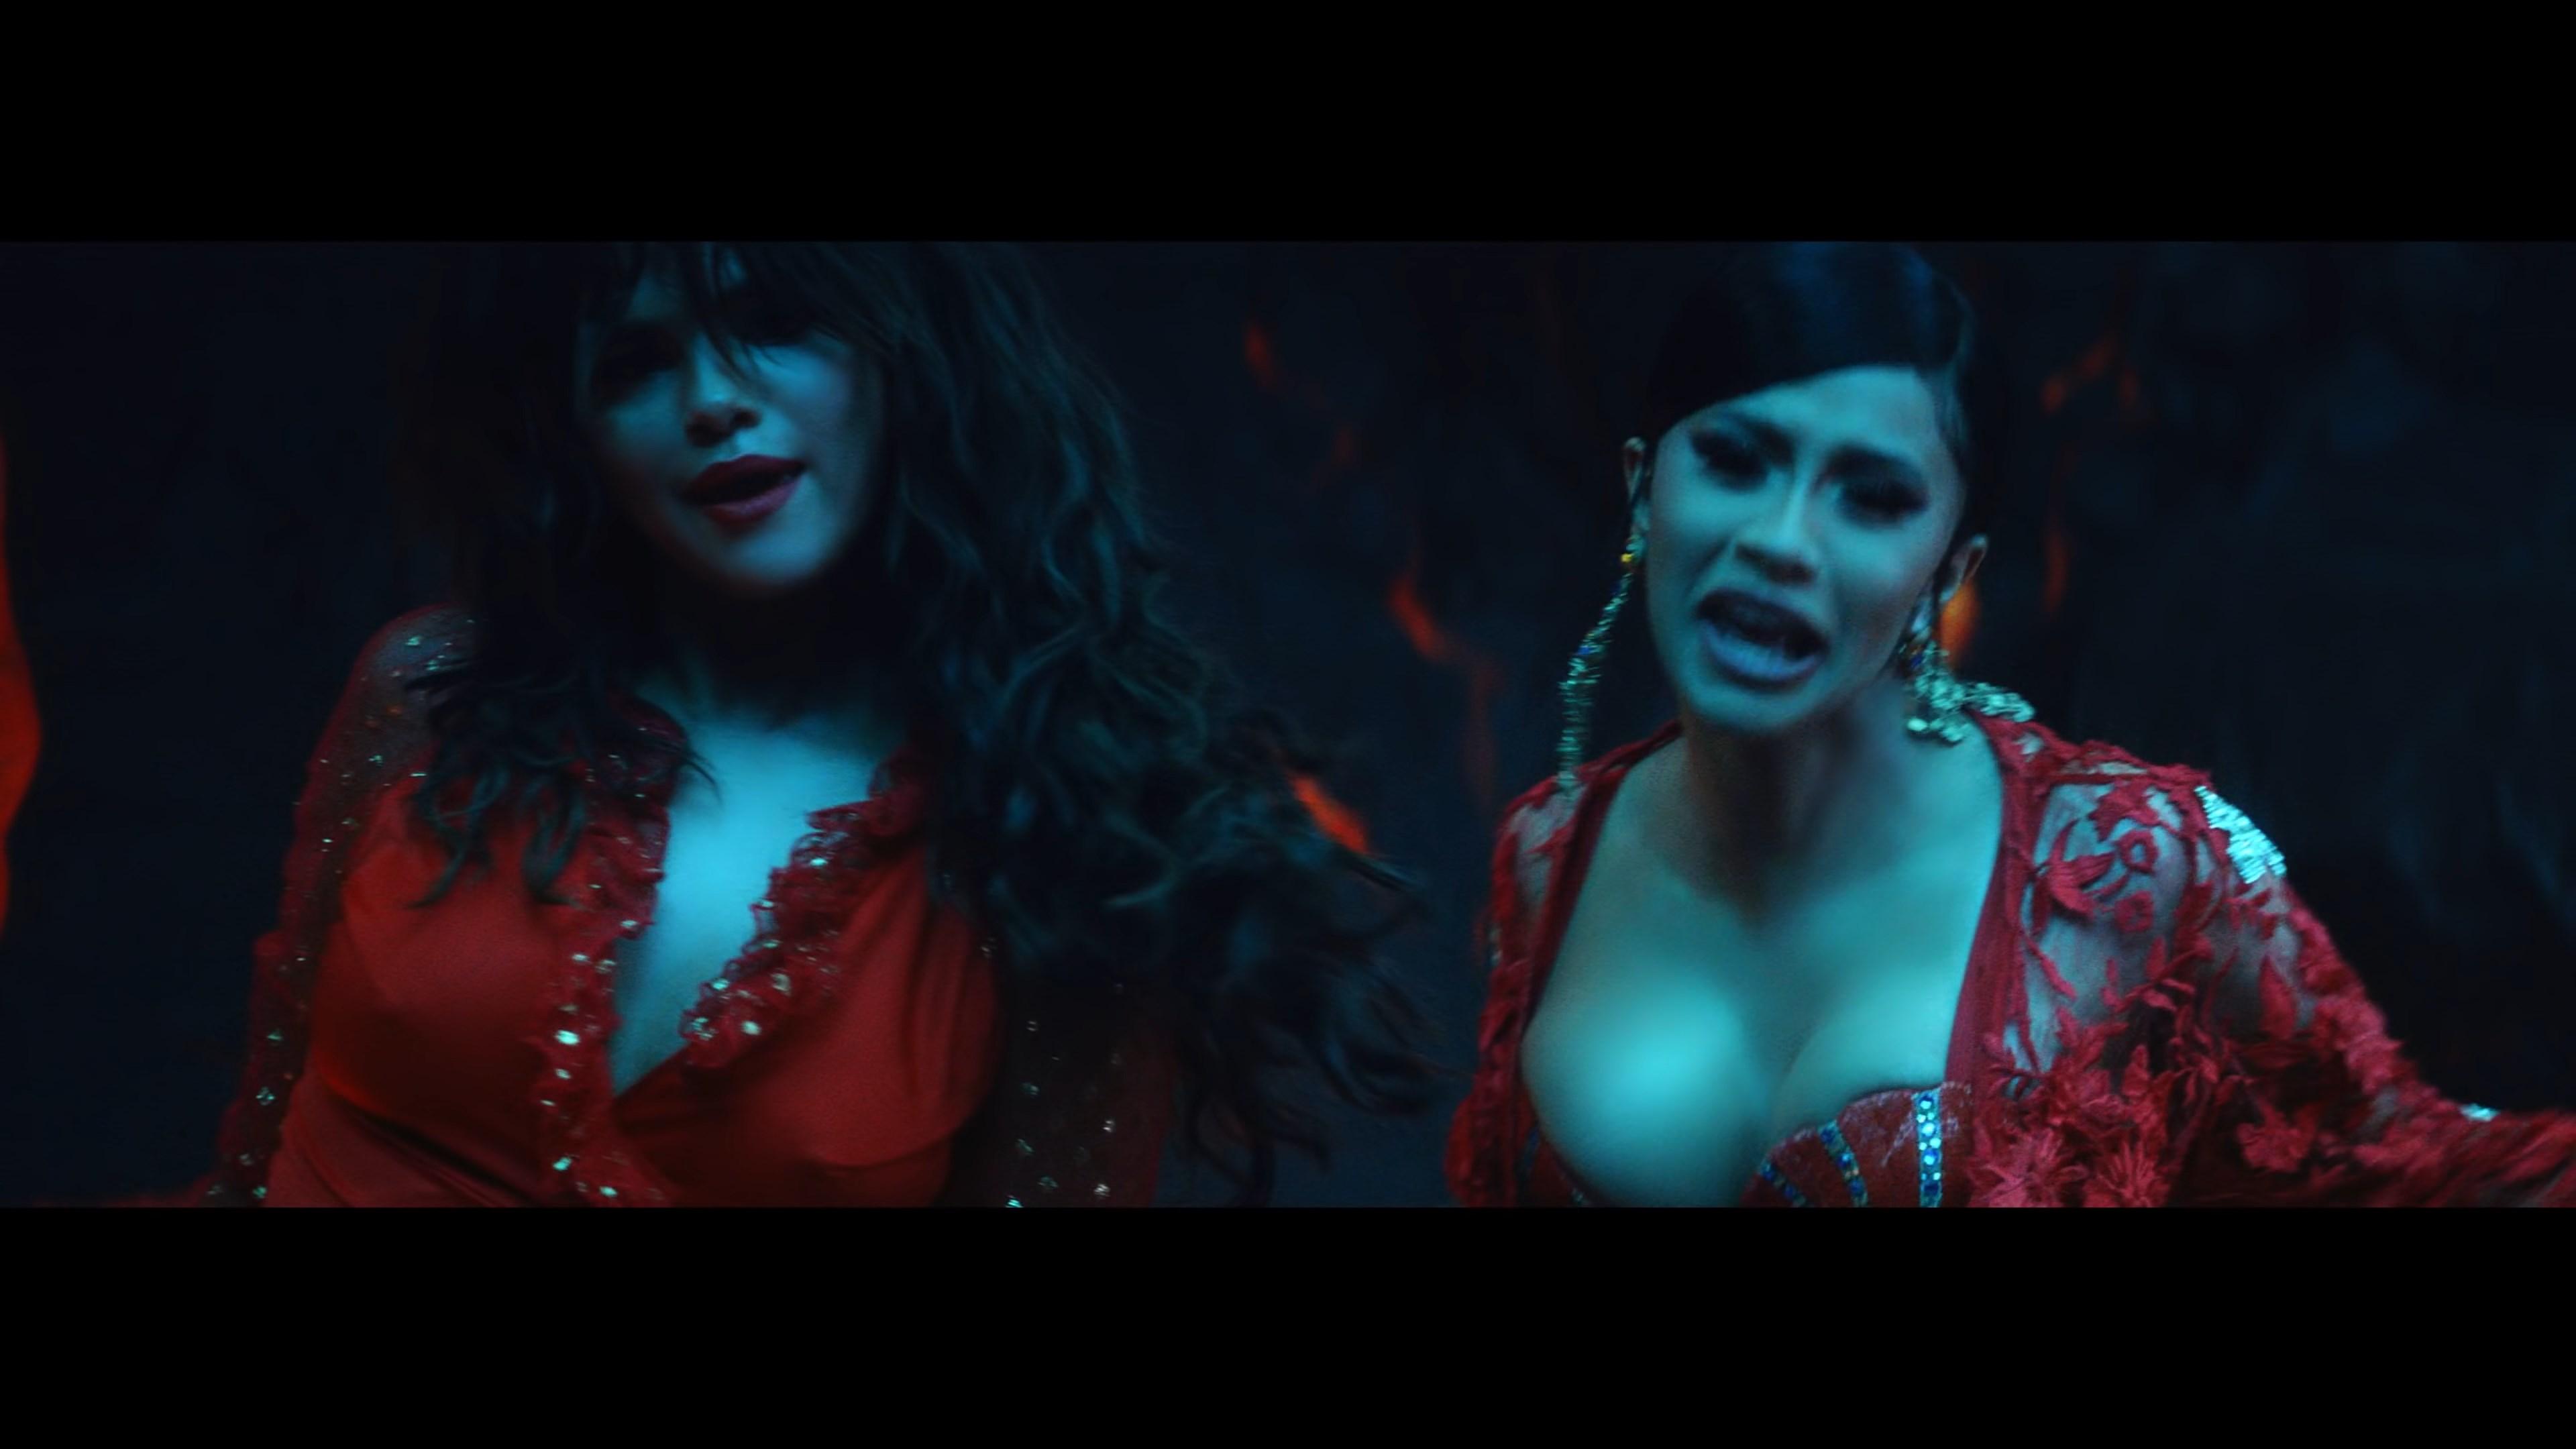 DJ Snake - Taki Taki ft. Selena Gomez, Ozuna, Cardi B.webm_snapshot_02.05_[2018.10.10_14.28.20].jpg